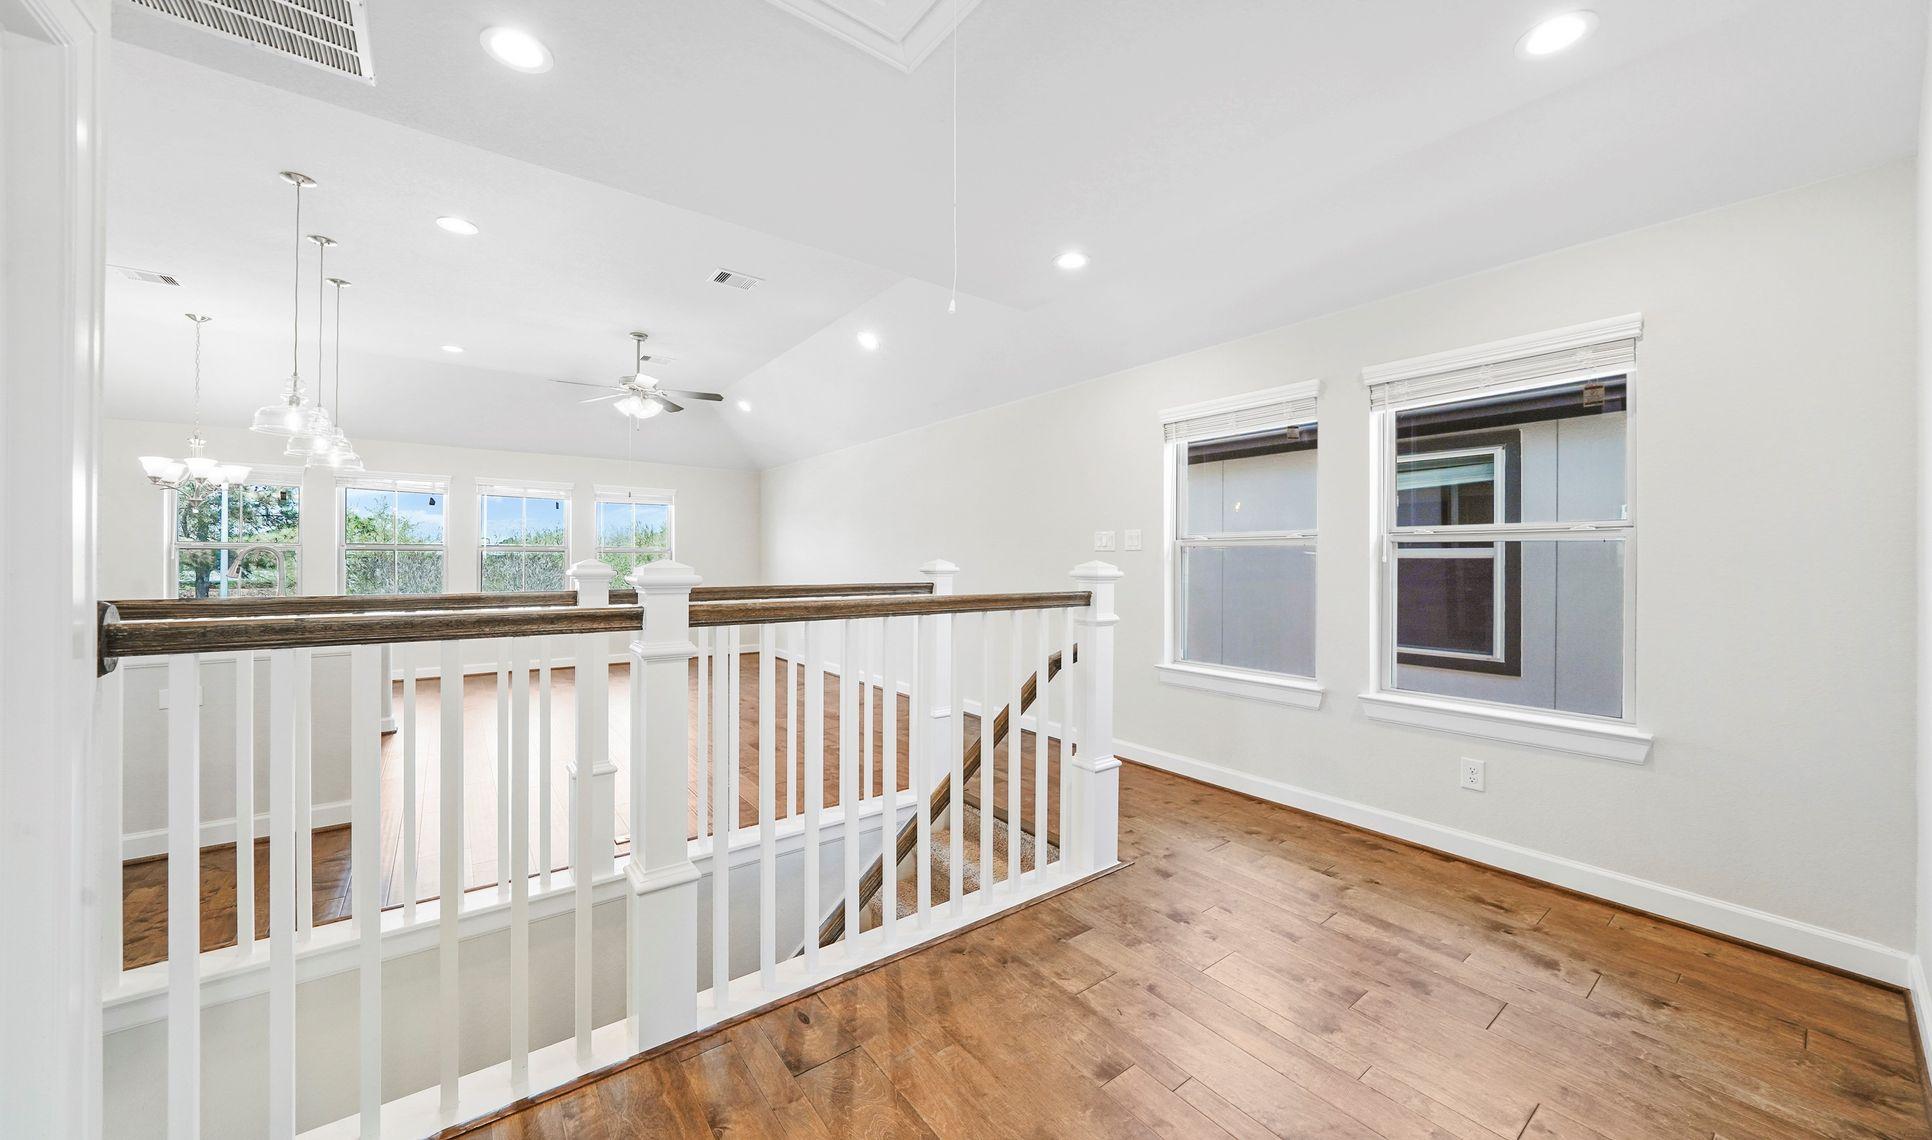 Interior:Second floor landing